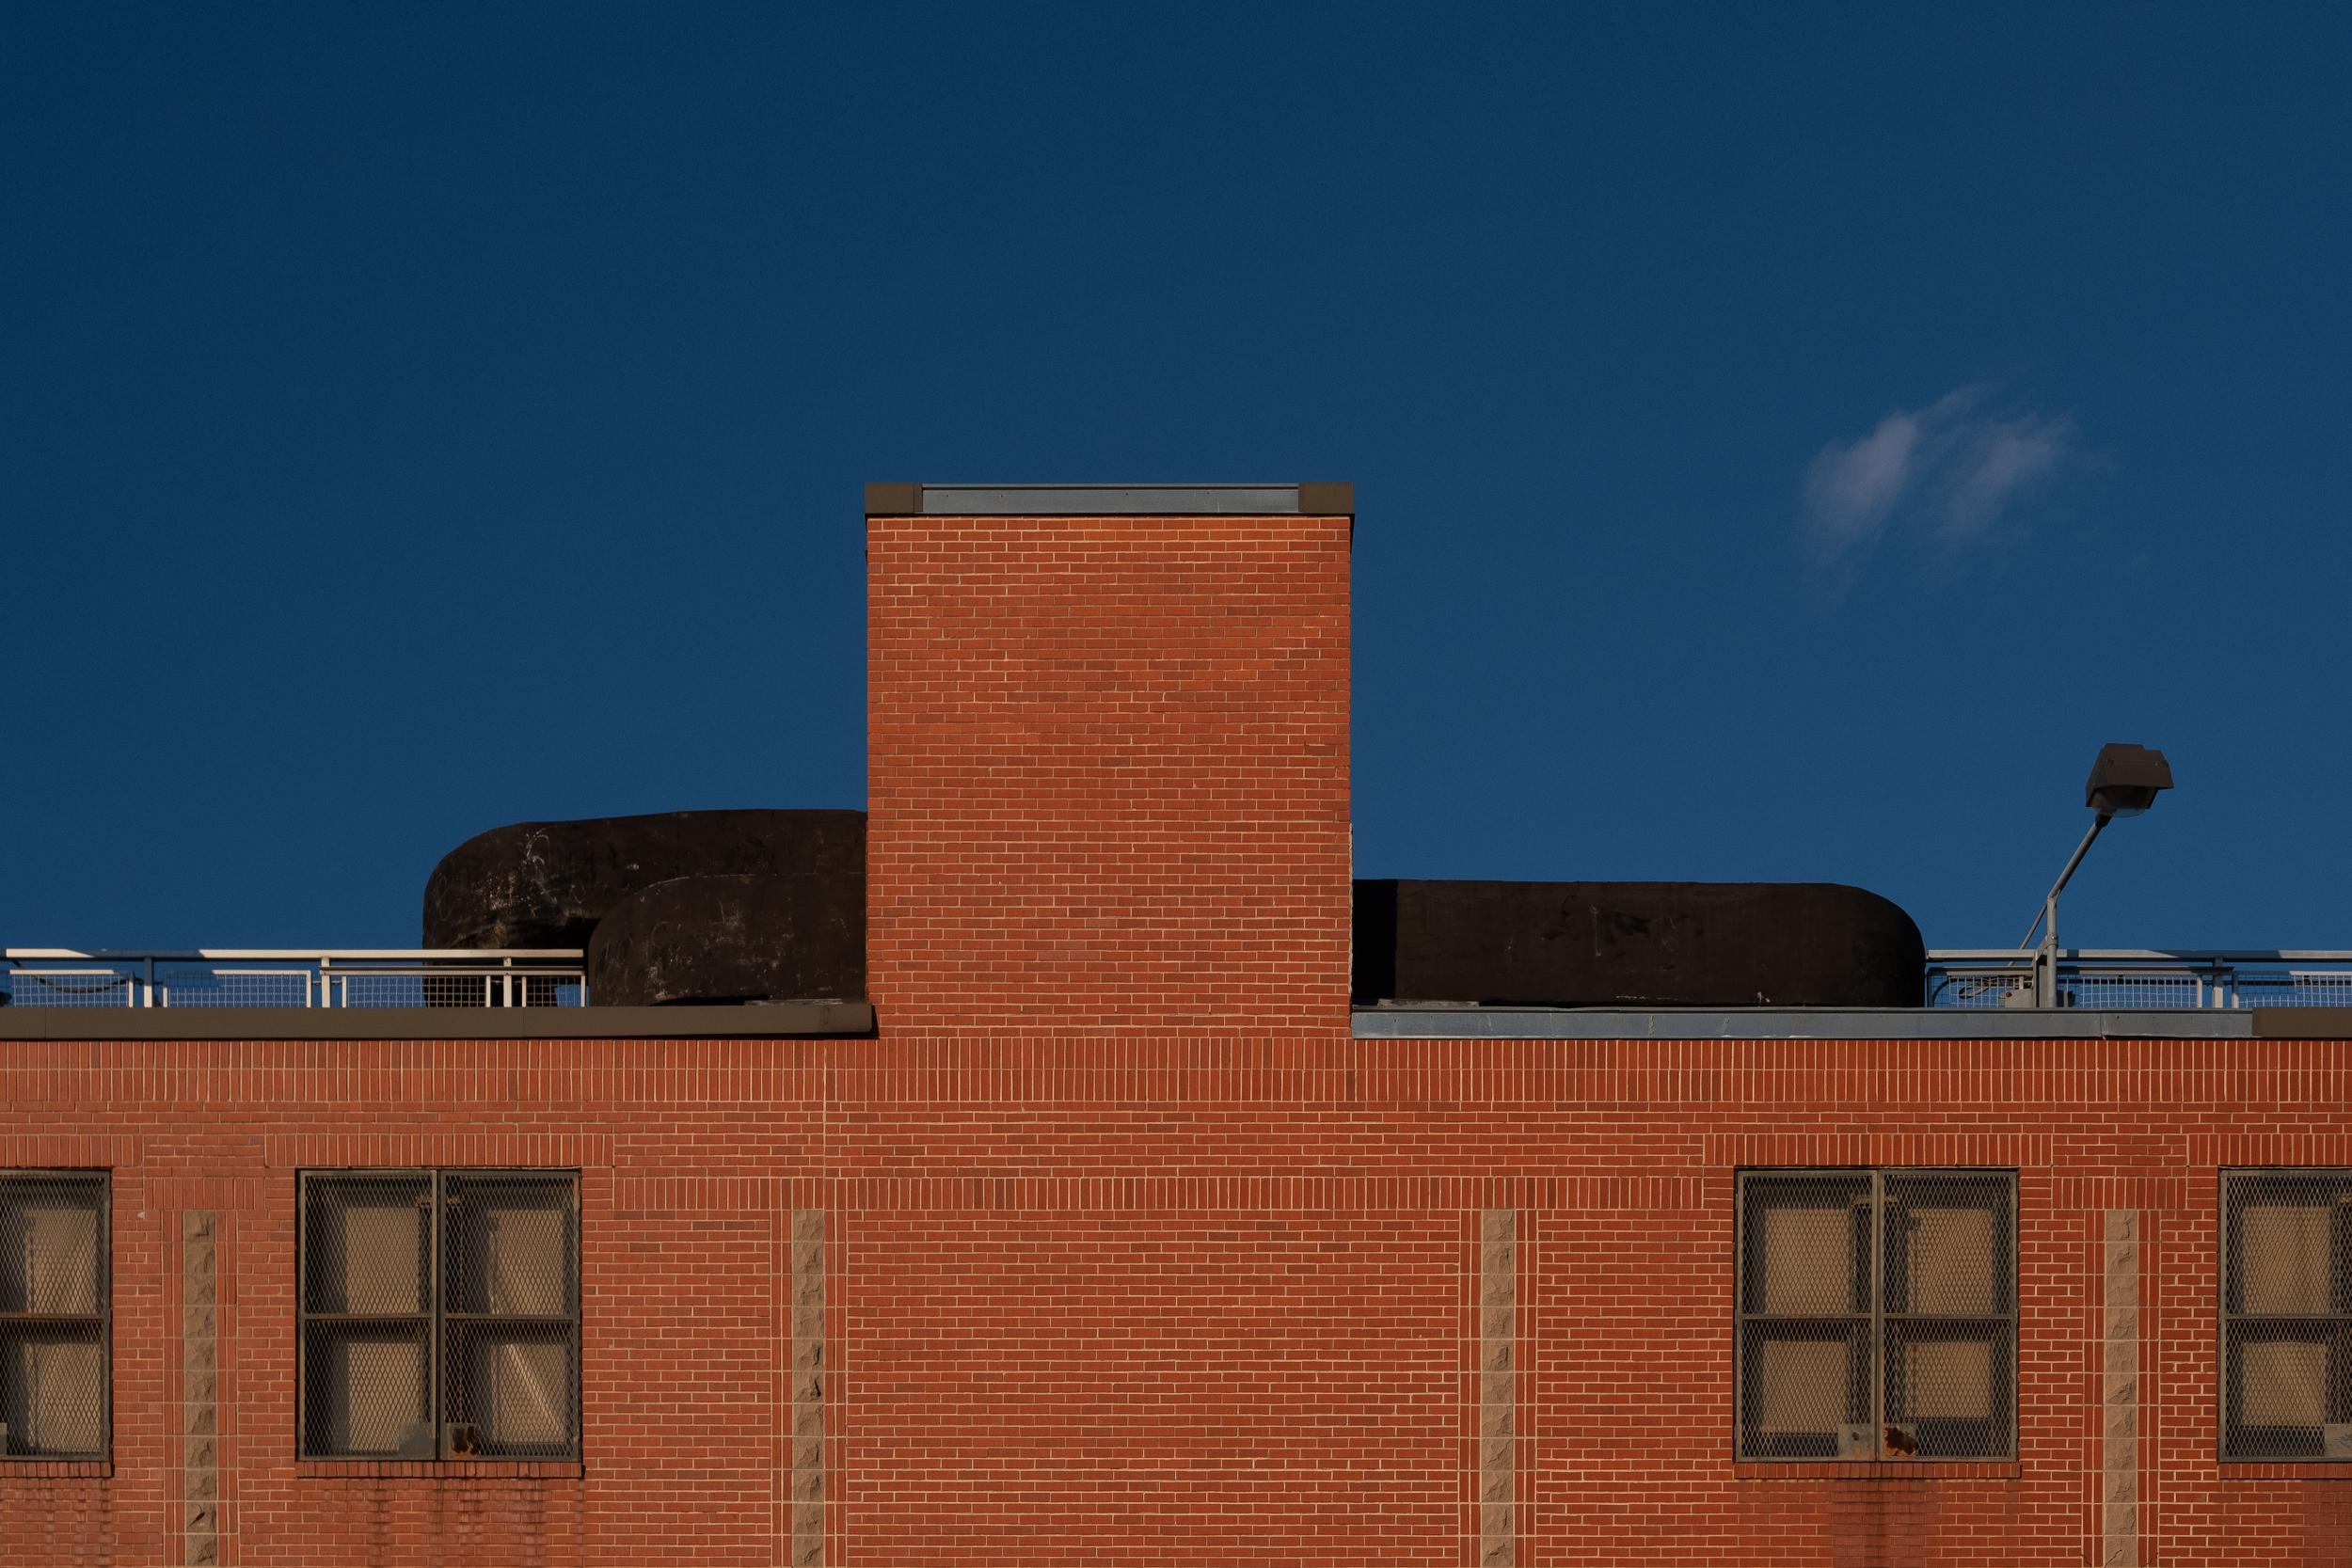 EH2401_Sky-Over-Bricks.jpg